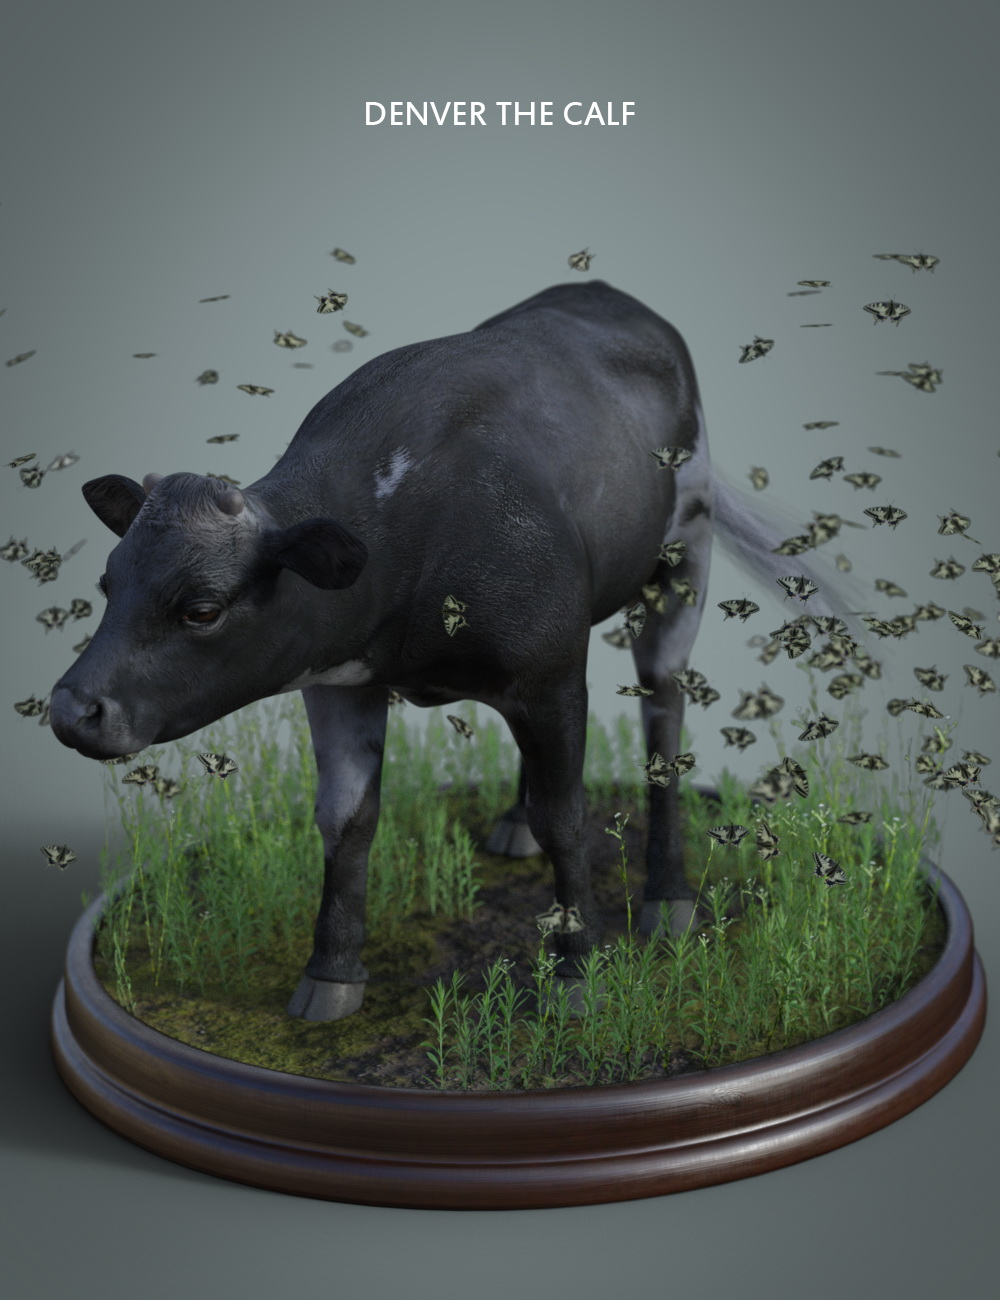 Denver The Calf HD for Daz Horse 2 by: Deepsea, 3D Models by Daz 3D